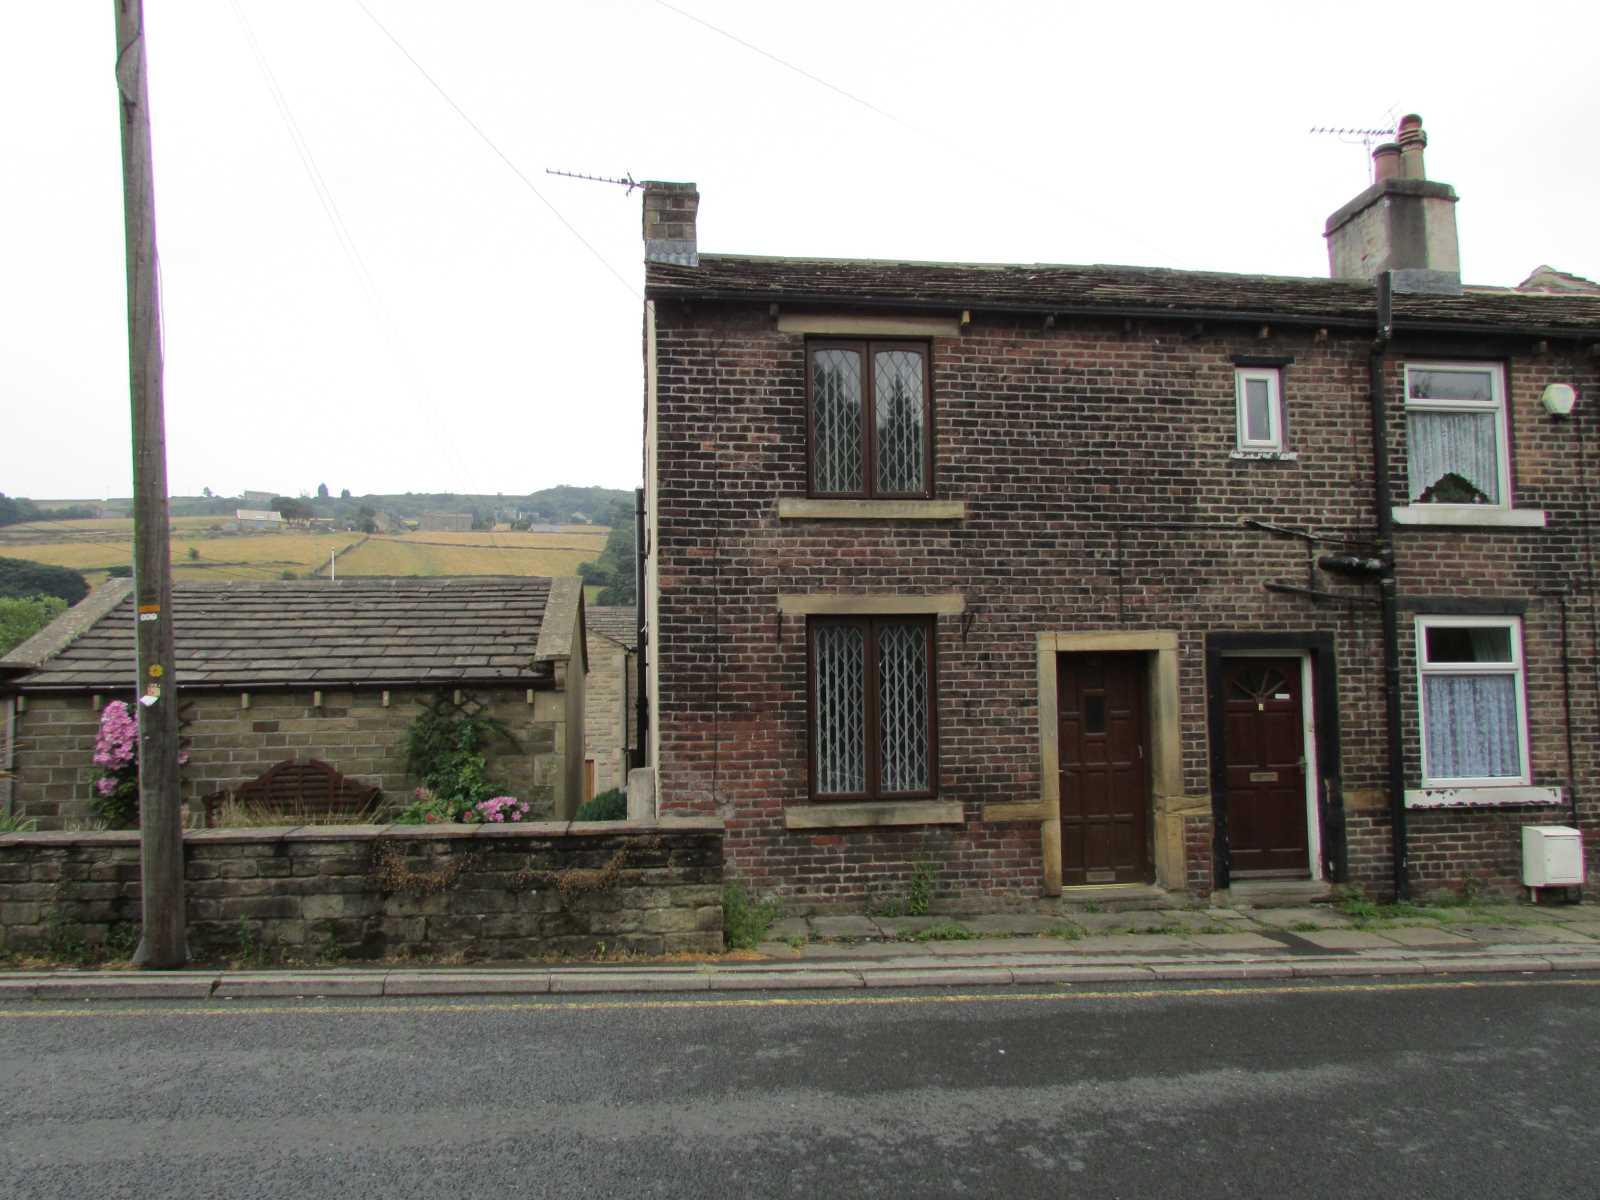 101 Woodhead Road, Holmfirth, Holmbridge hd9 2nw, UK